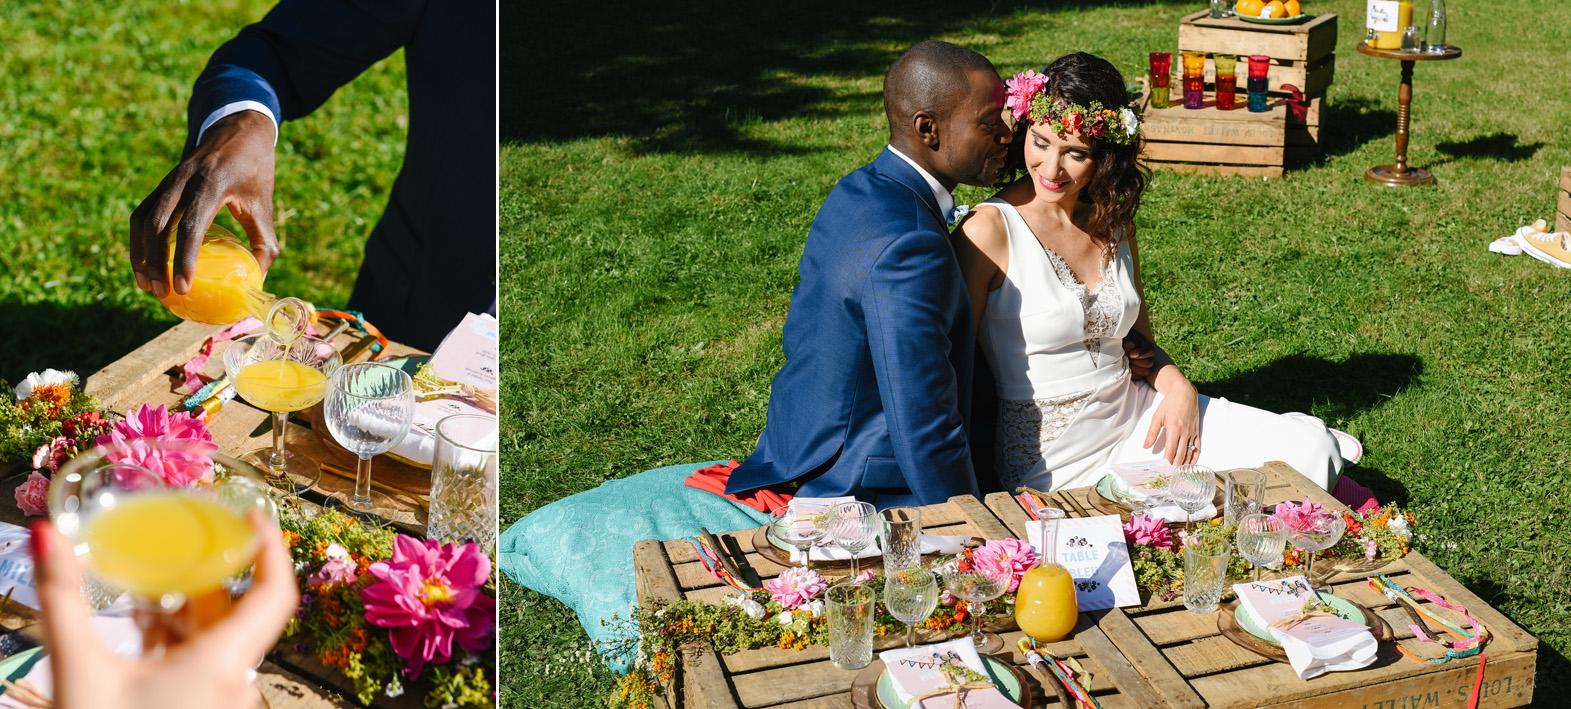 shooting_inspiration_mariage_peps_wedding_95_photographe_clemence_dubois-mep13